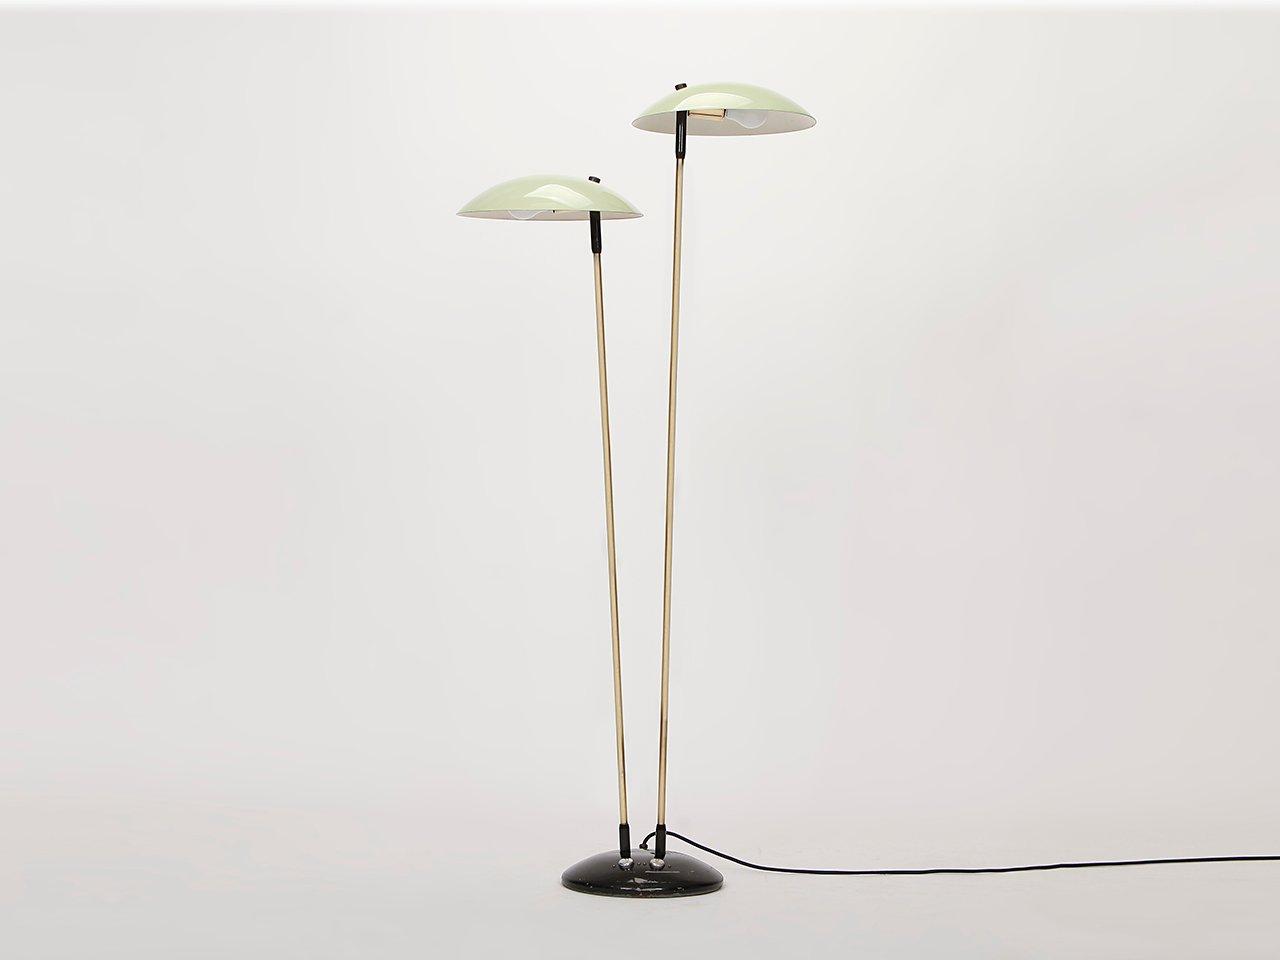 midcentury floor lamp from drukov 1960s